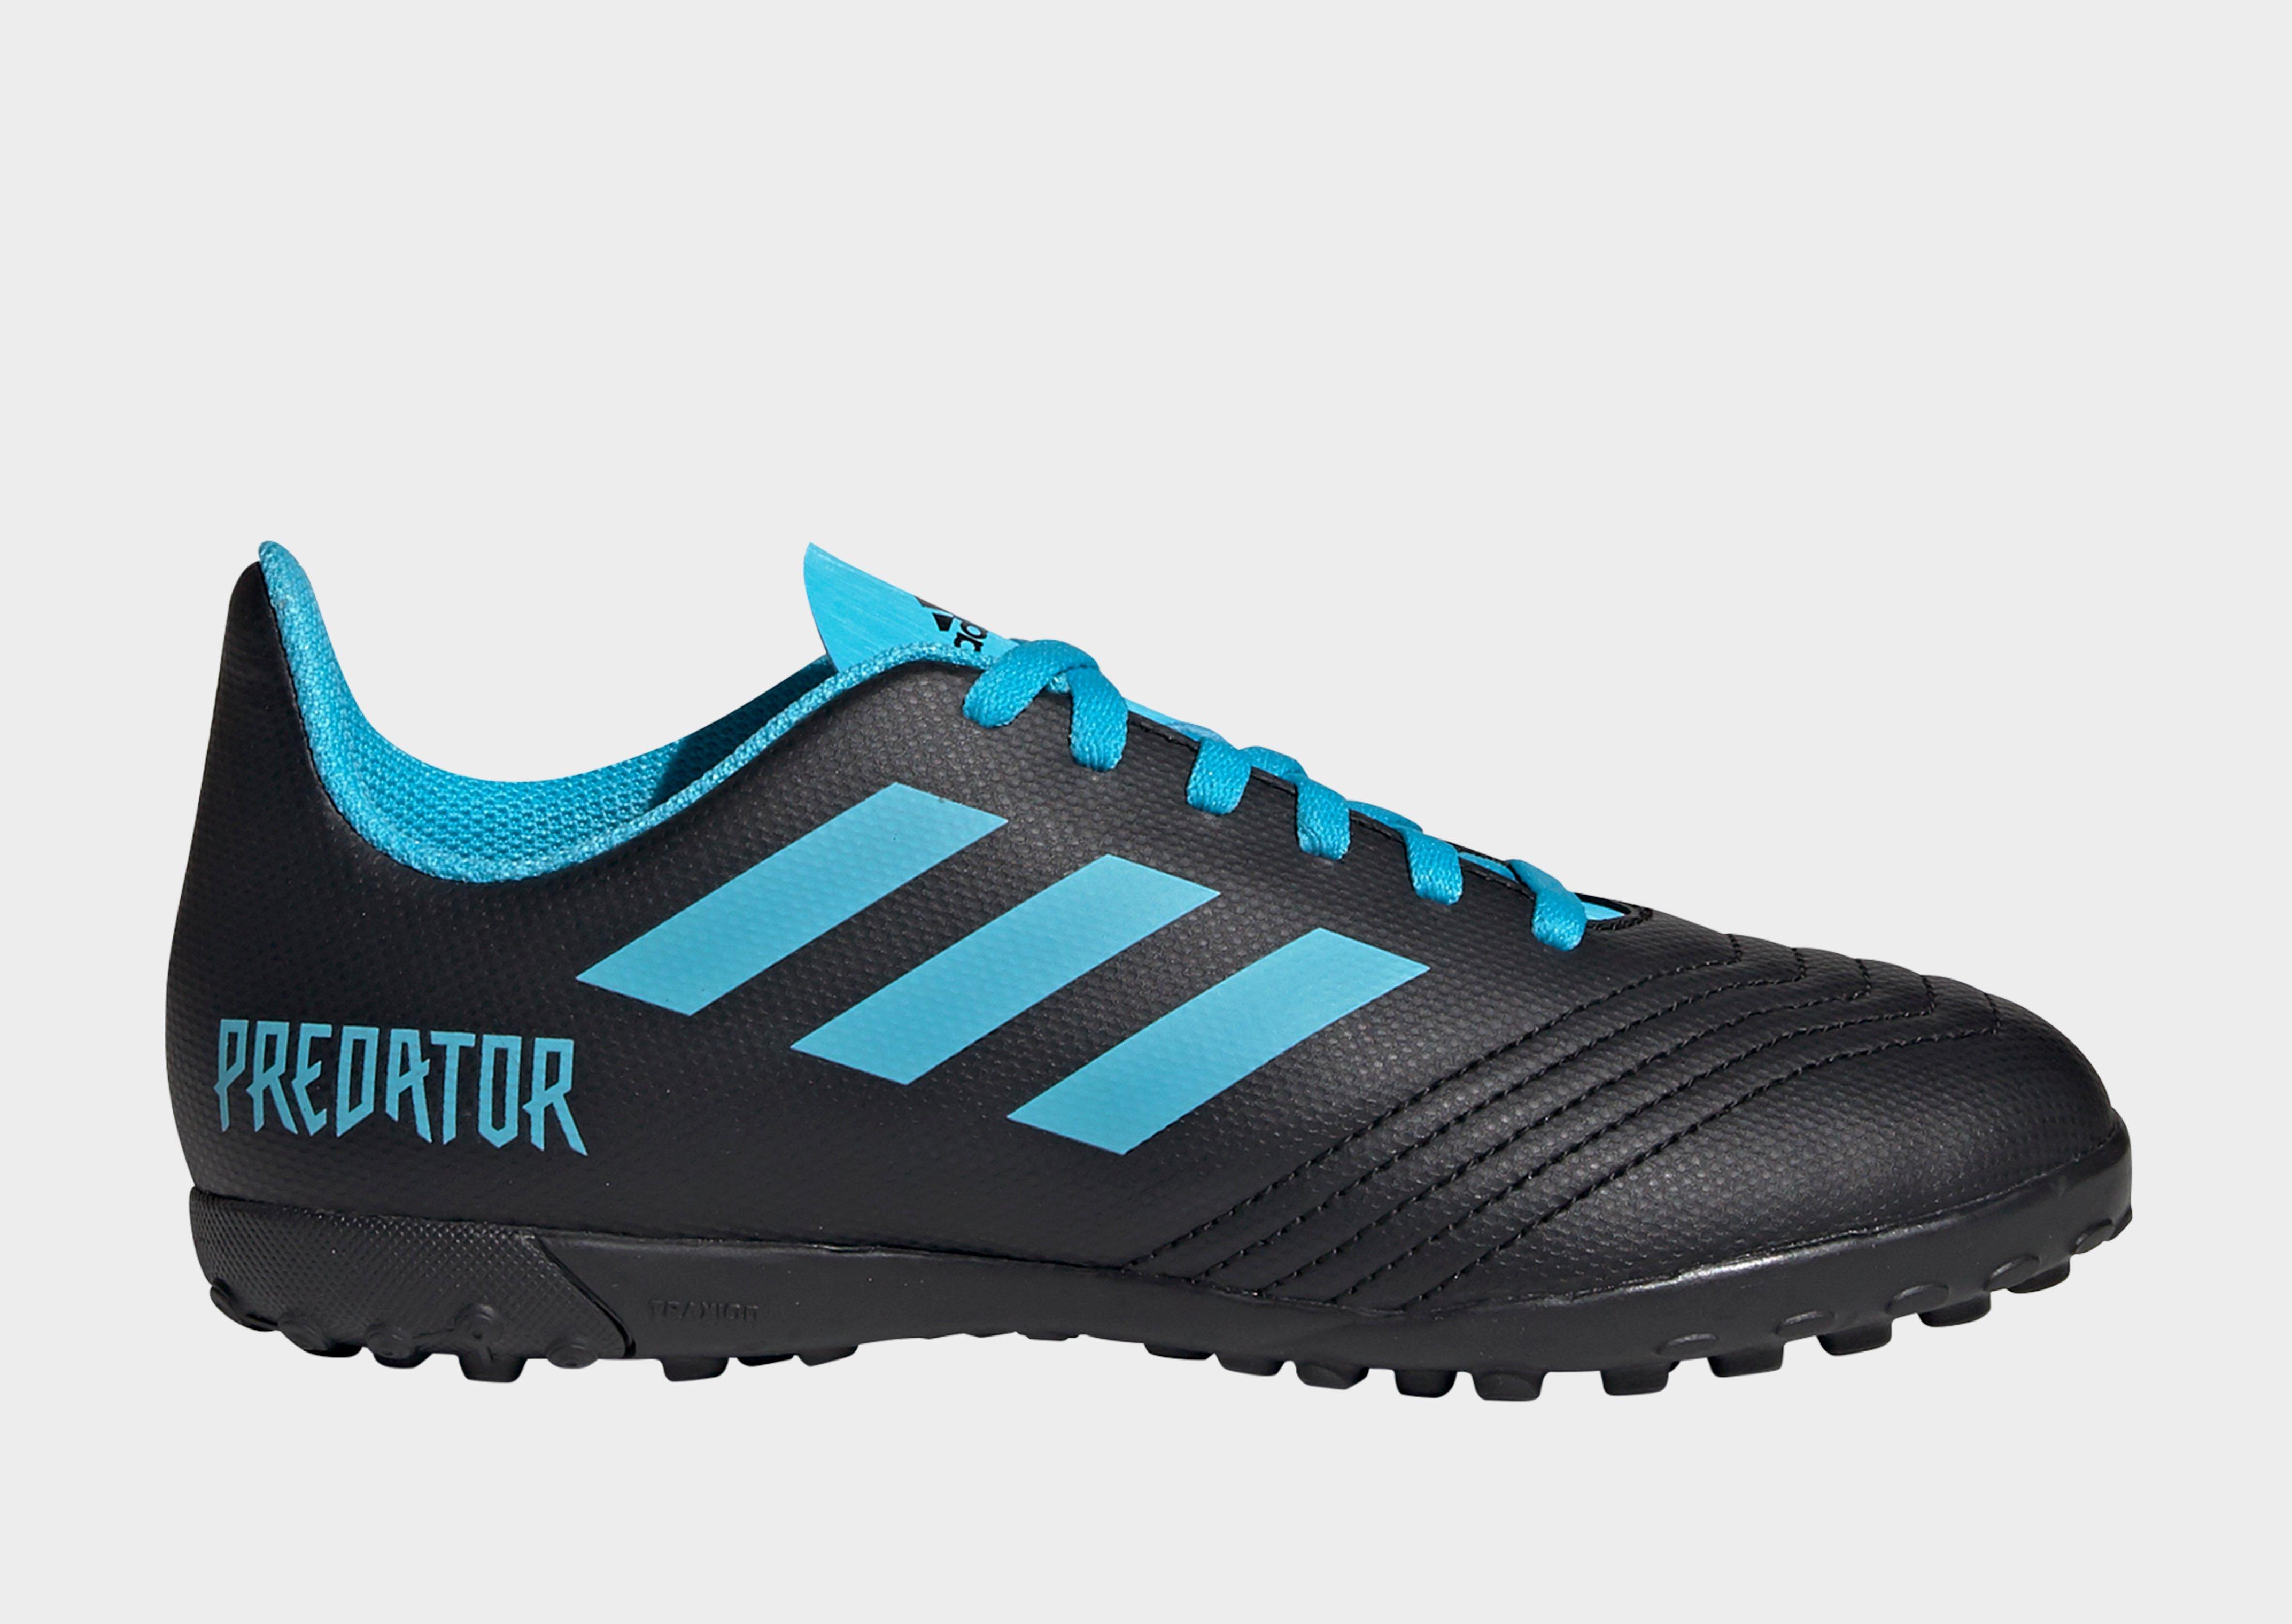 adidas Hard Wired Predator 19.4 TF Junior | JD Sports